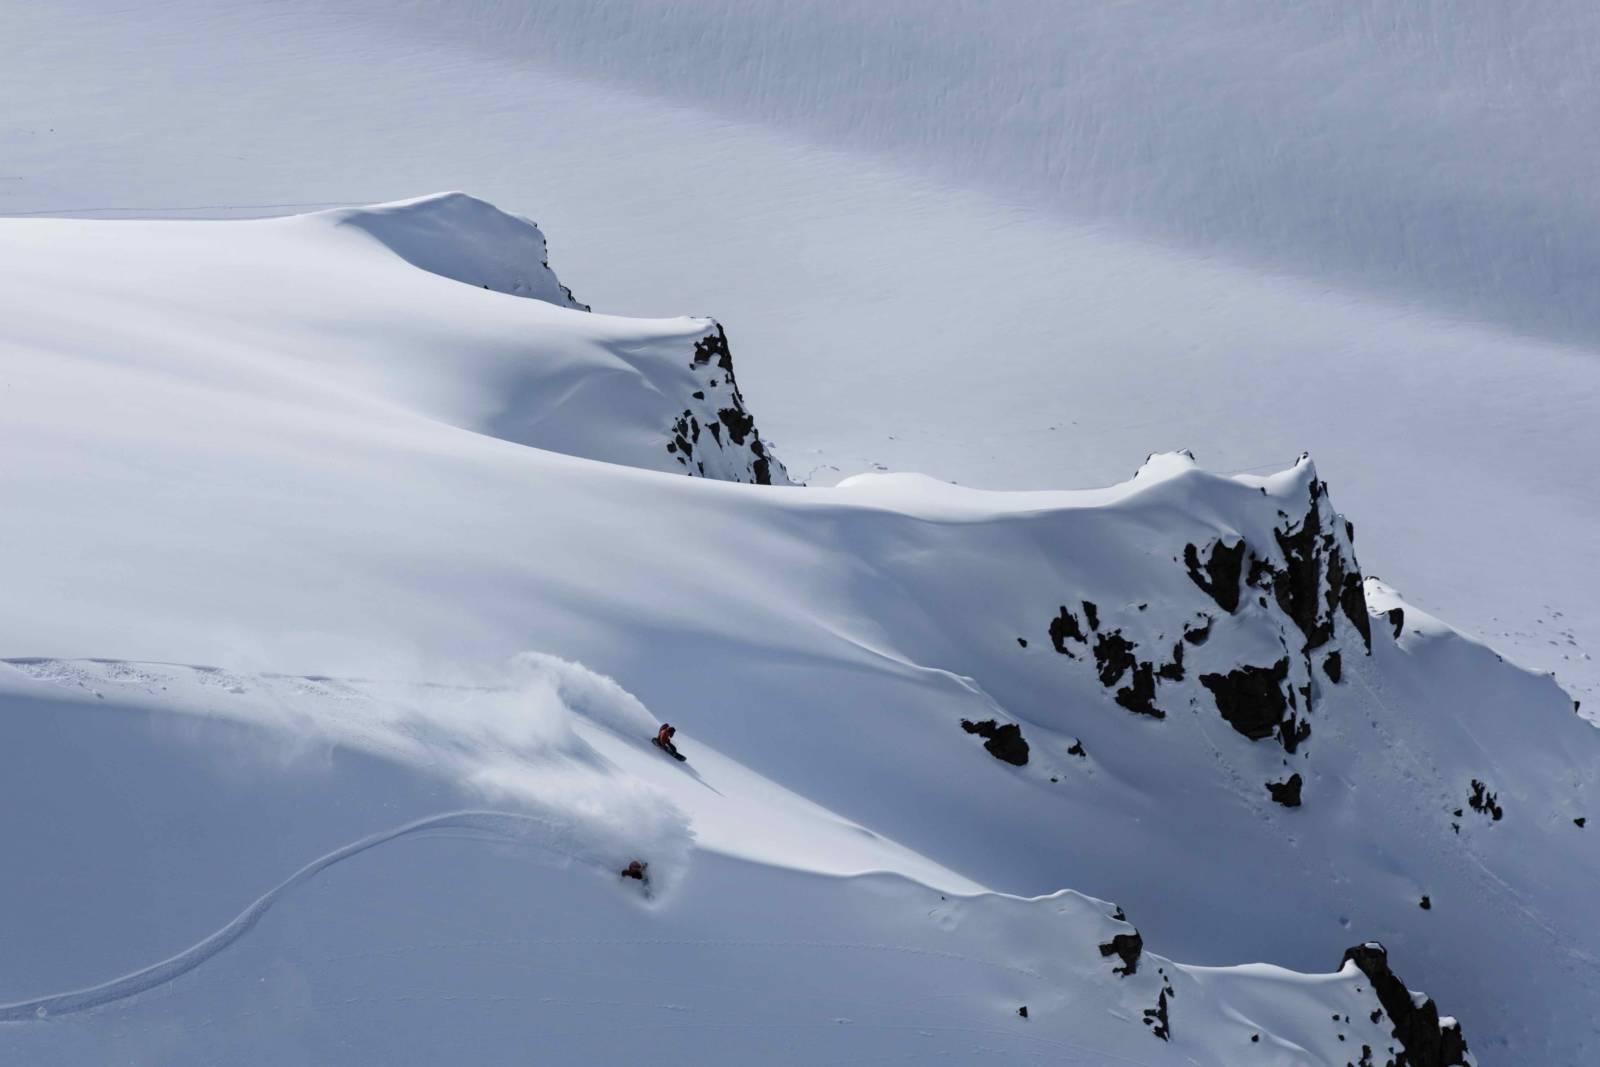 heliski island , snowboarder full speed